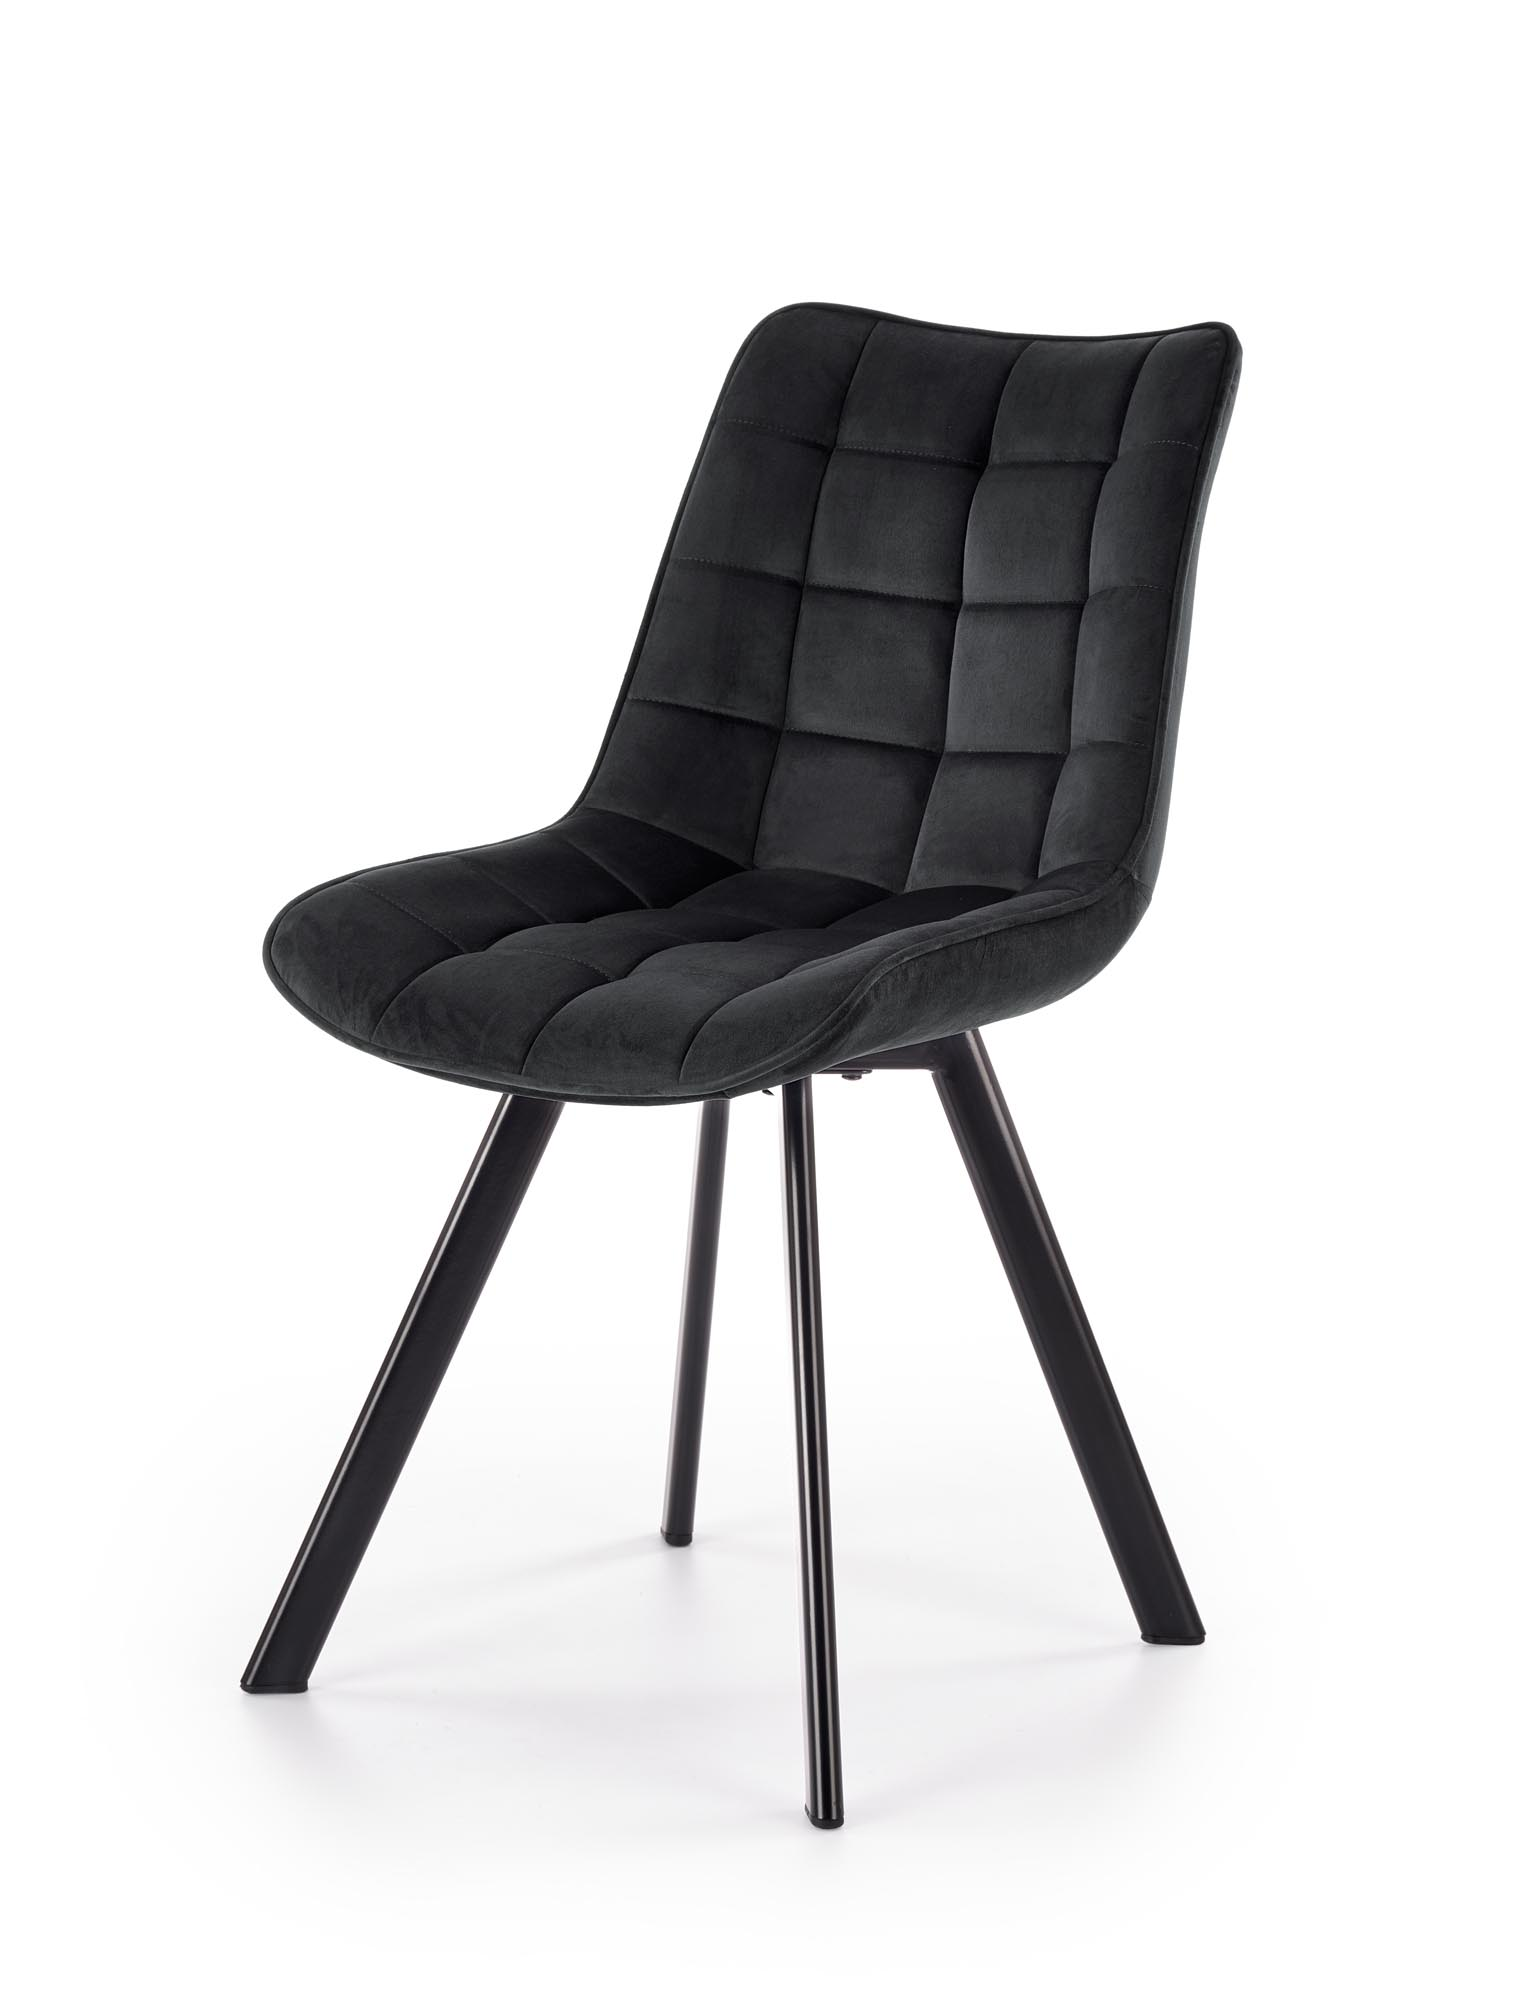 K332 stolička nohy - čierne, sedák - čierna